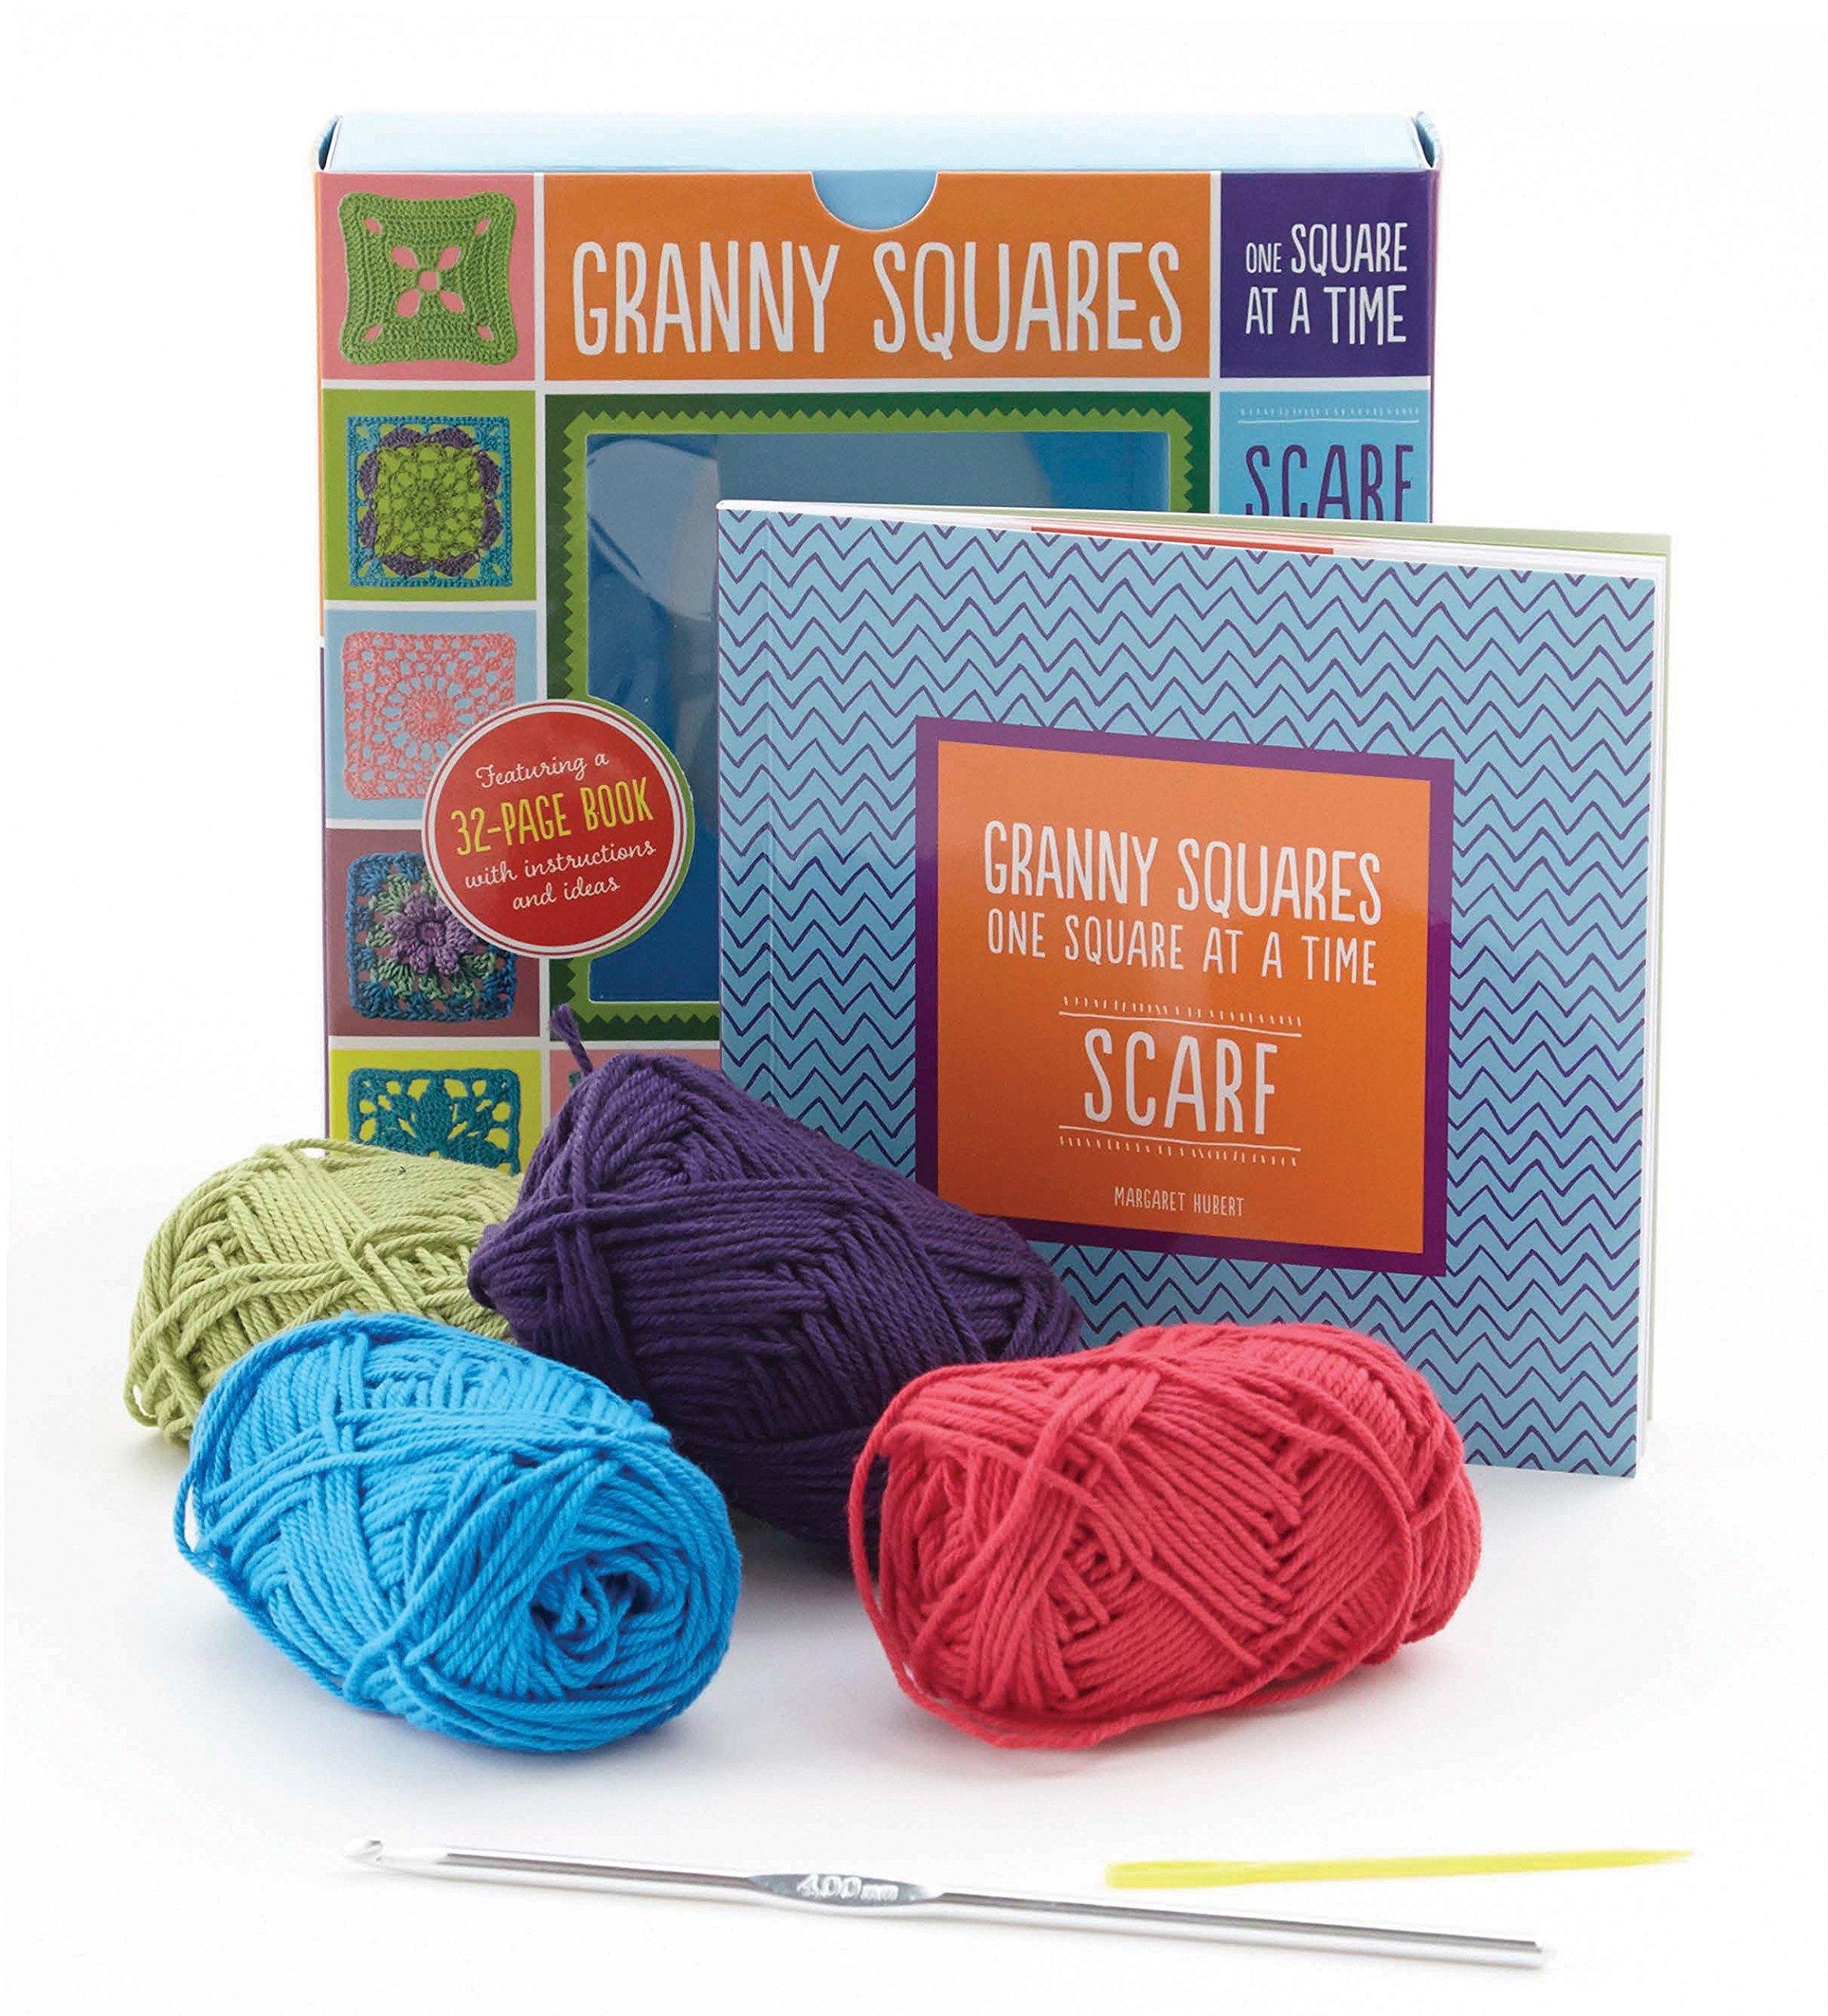 Crochet Beginner Kit Granny Square tutorial and yarn